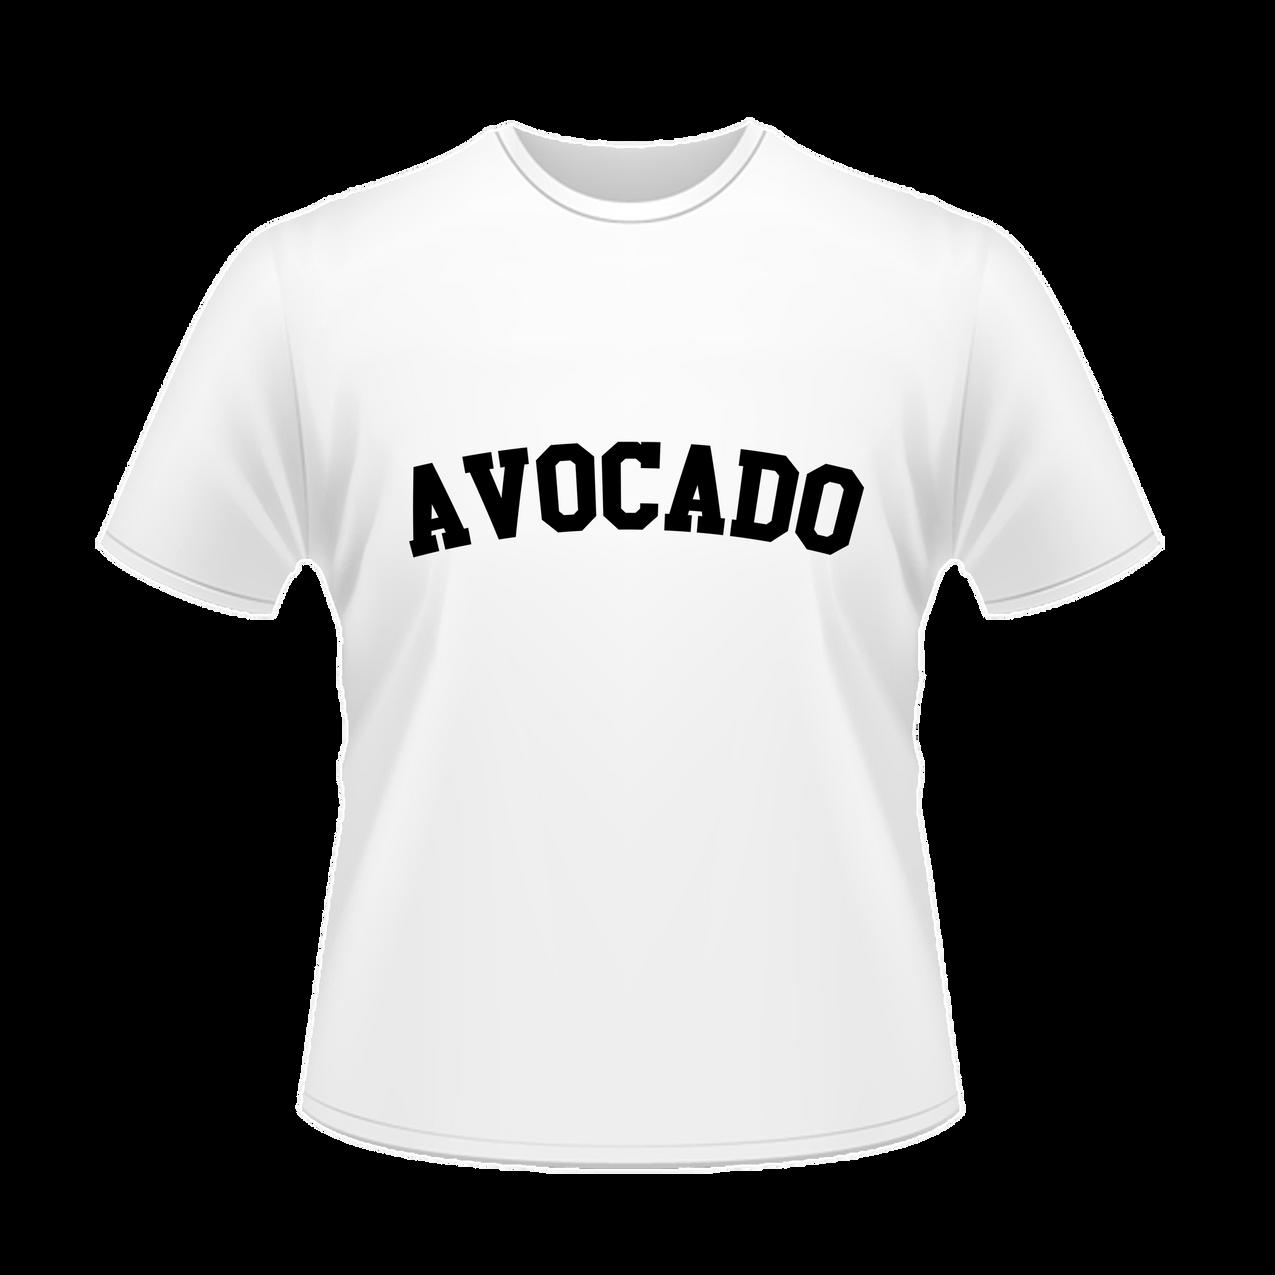 Avocado (White)